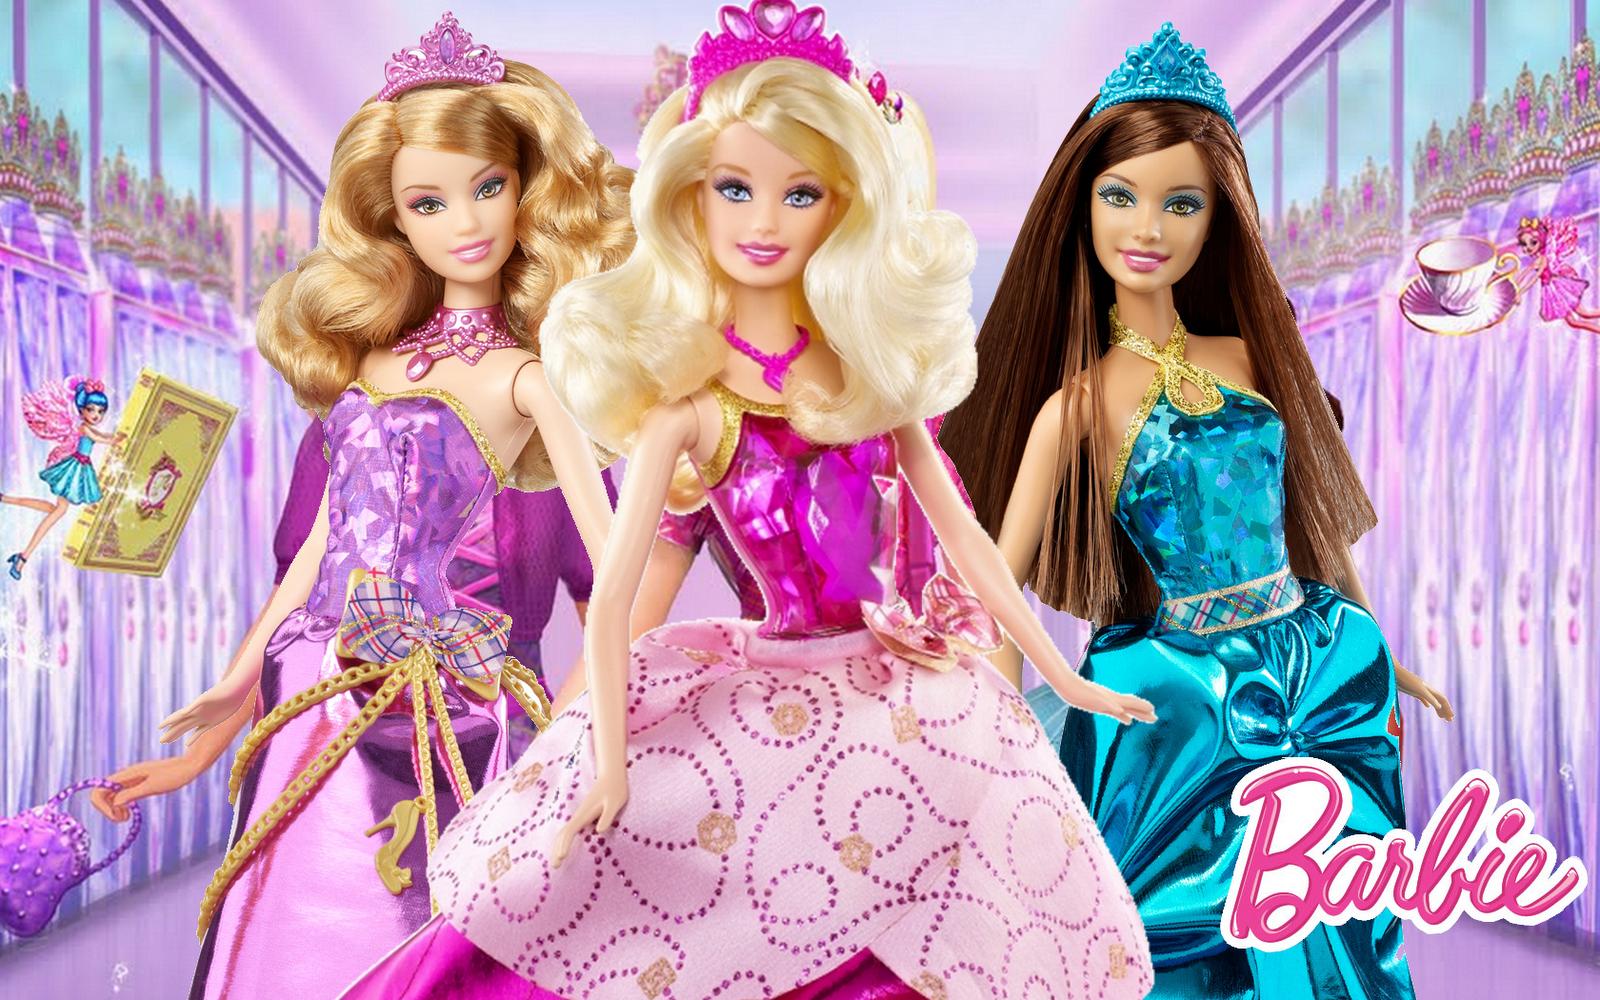 Barbie Wallpapers Desktop Wallpaper Hungama 1600x1000